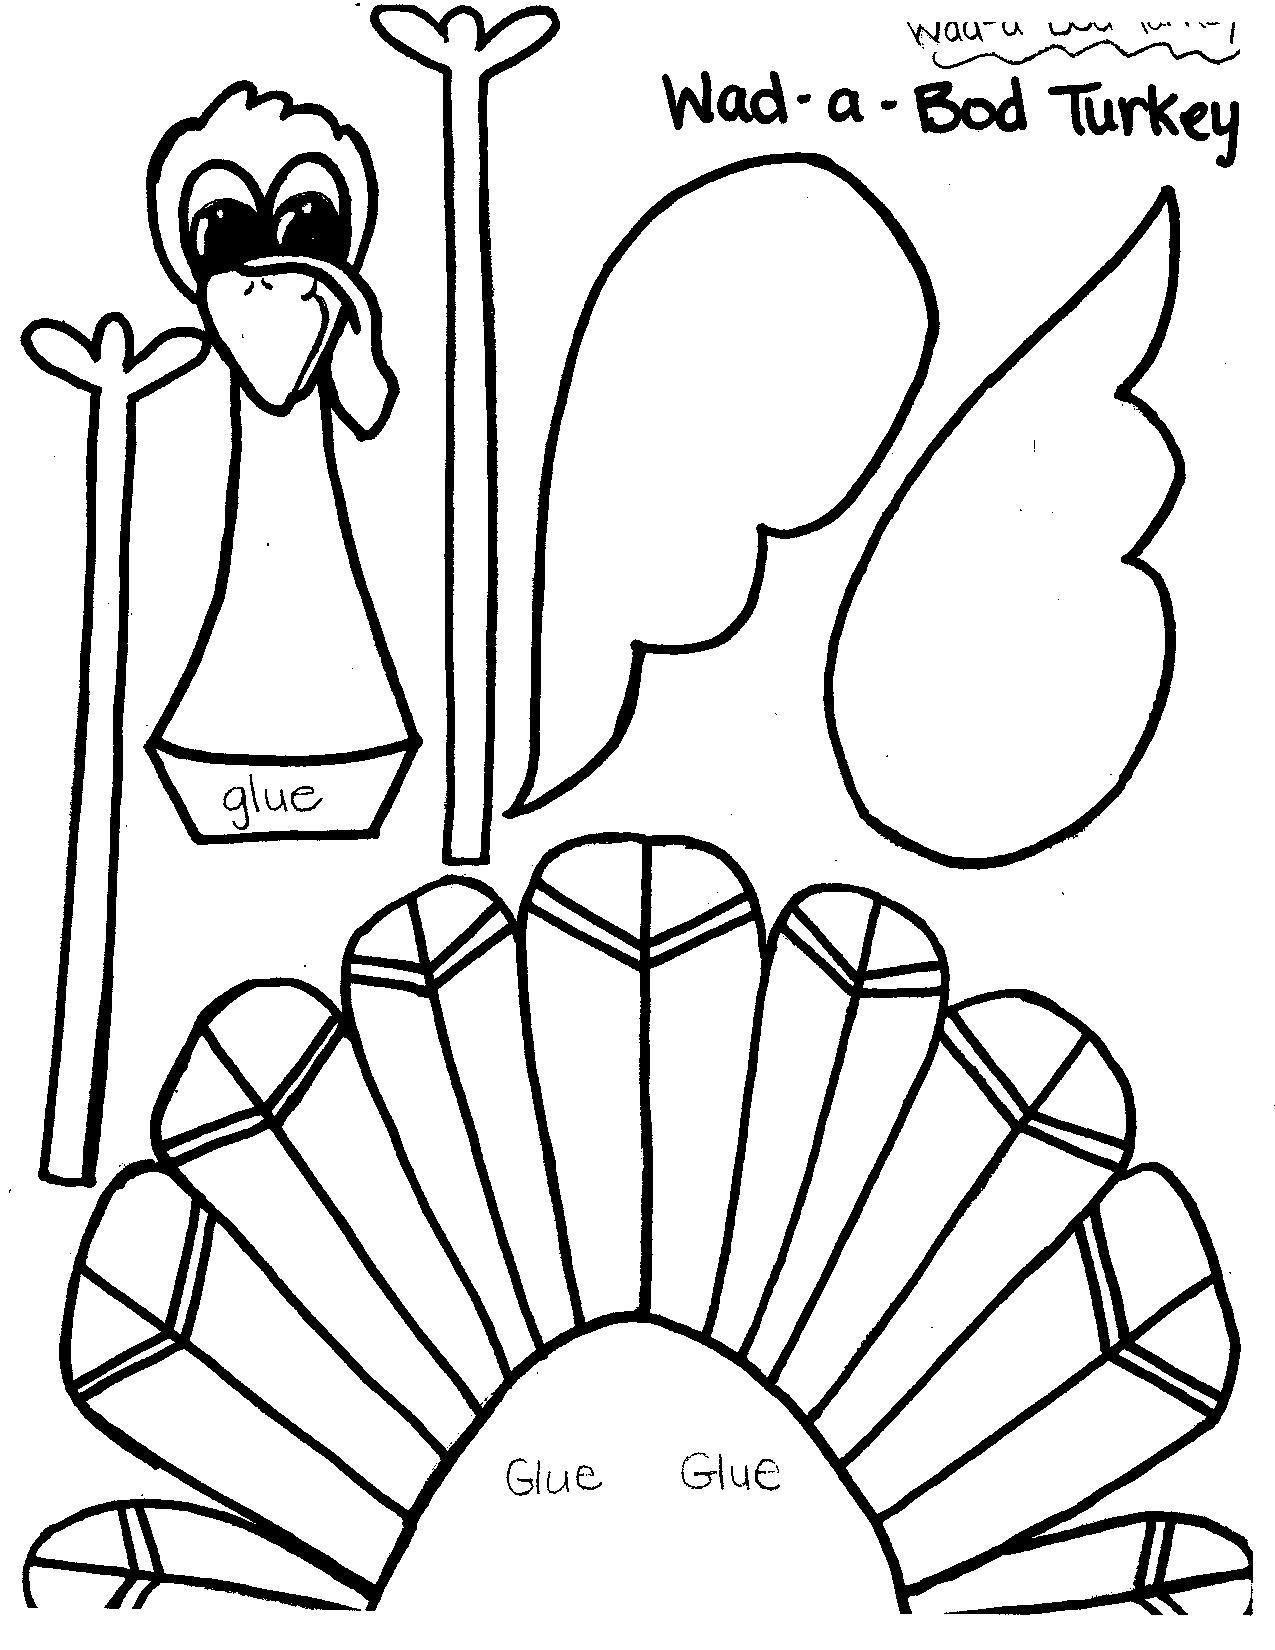 Printable Thanksgiving Turkey Templates – Happy Easter - Free Printable Thanksgiving Turkey Template